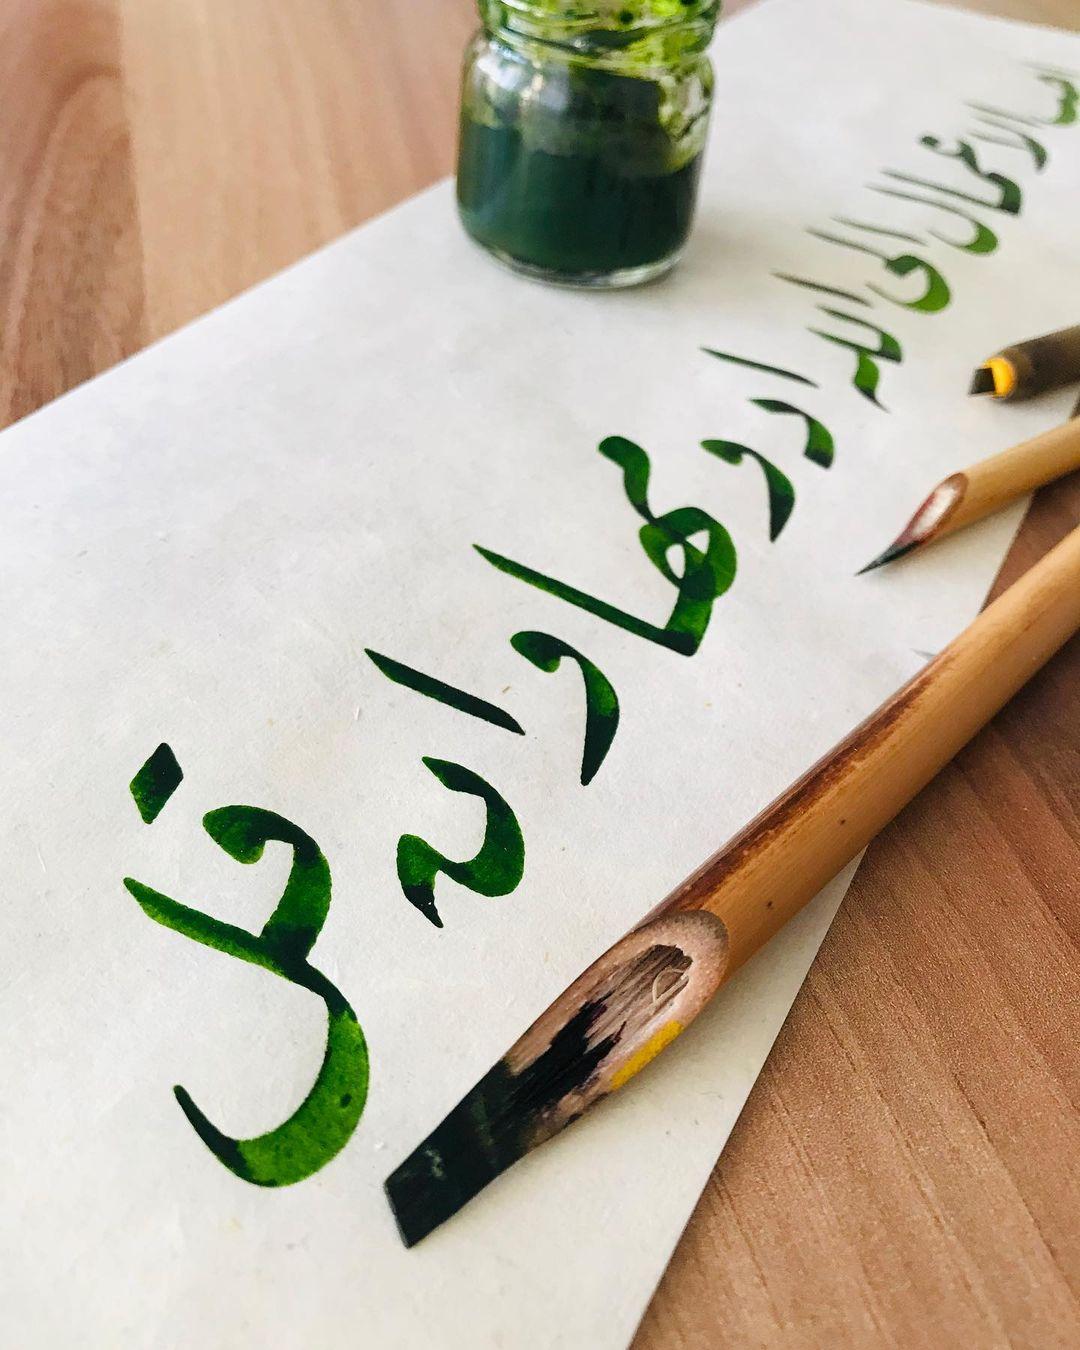 Donwload Photo #arabiccalligraphy #islamiccalligraphy #tezhip #hüsnühat #hüsnihat #kaligrafi...- hattat_aa 4